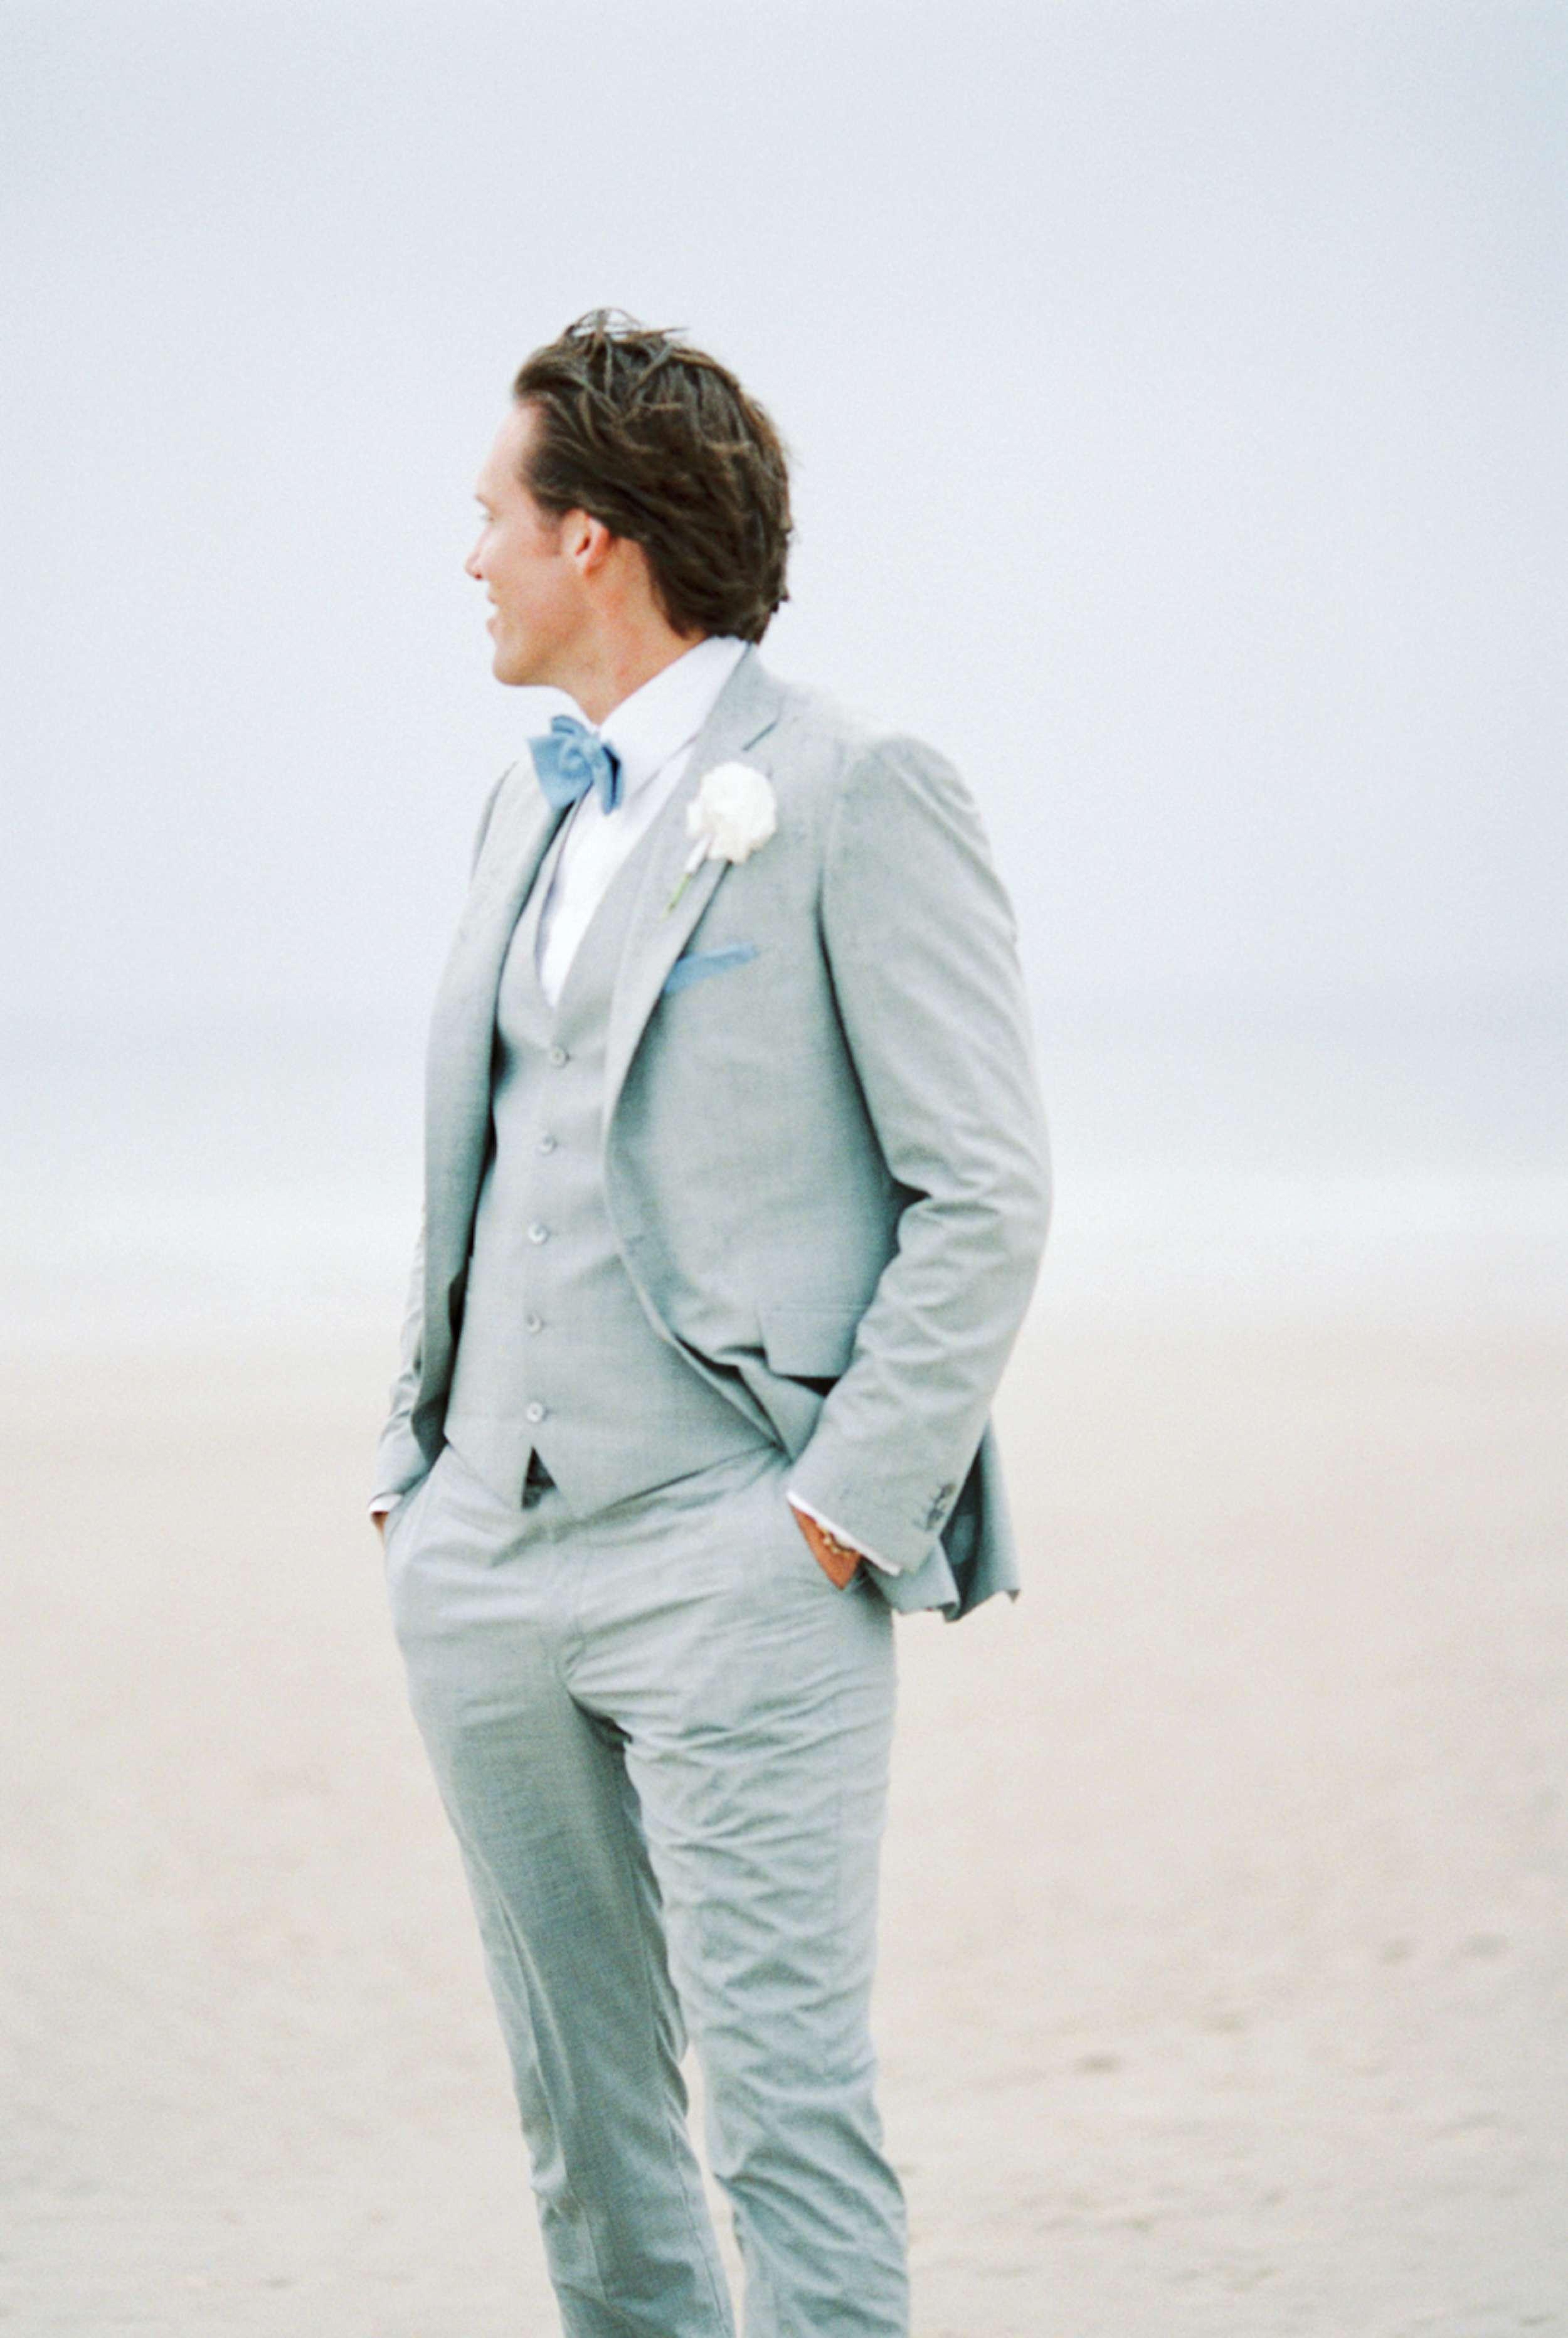 Groom beach wedding North Sea portrait